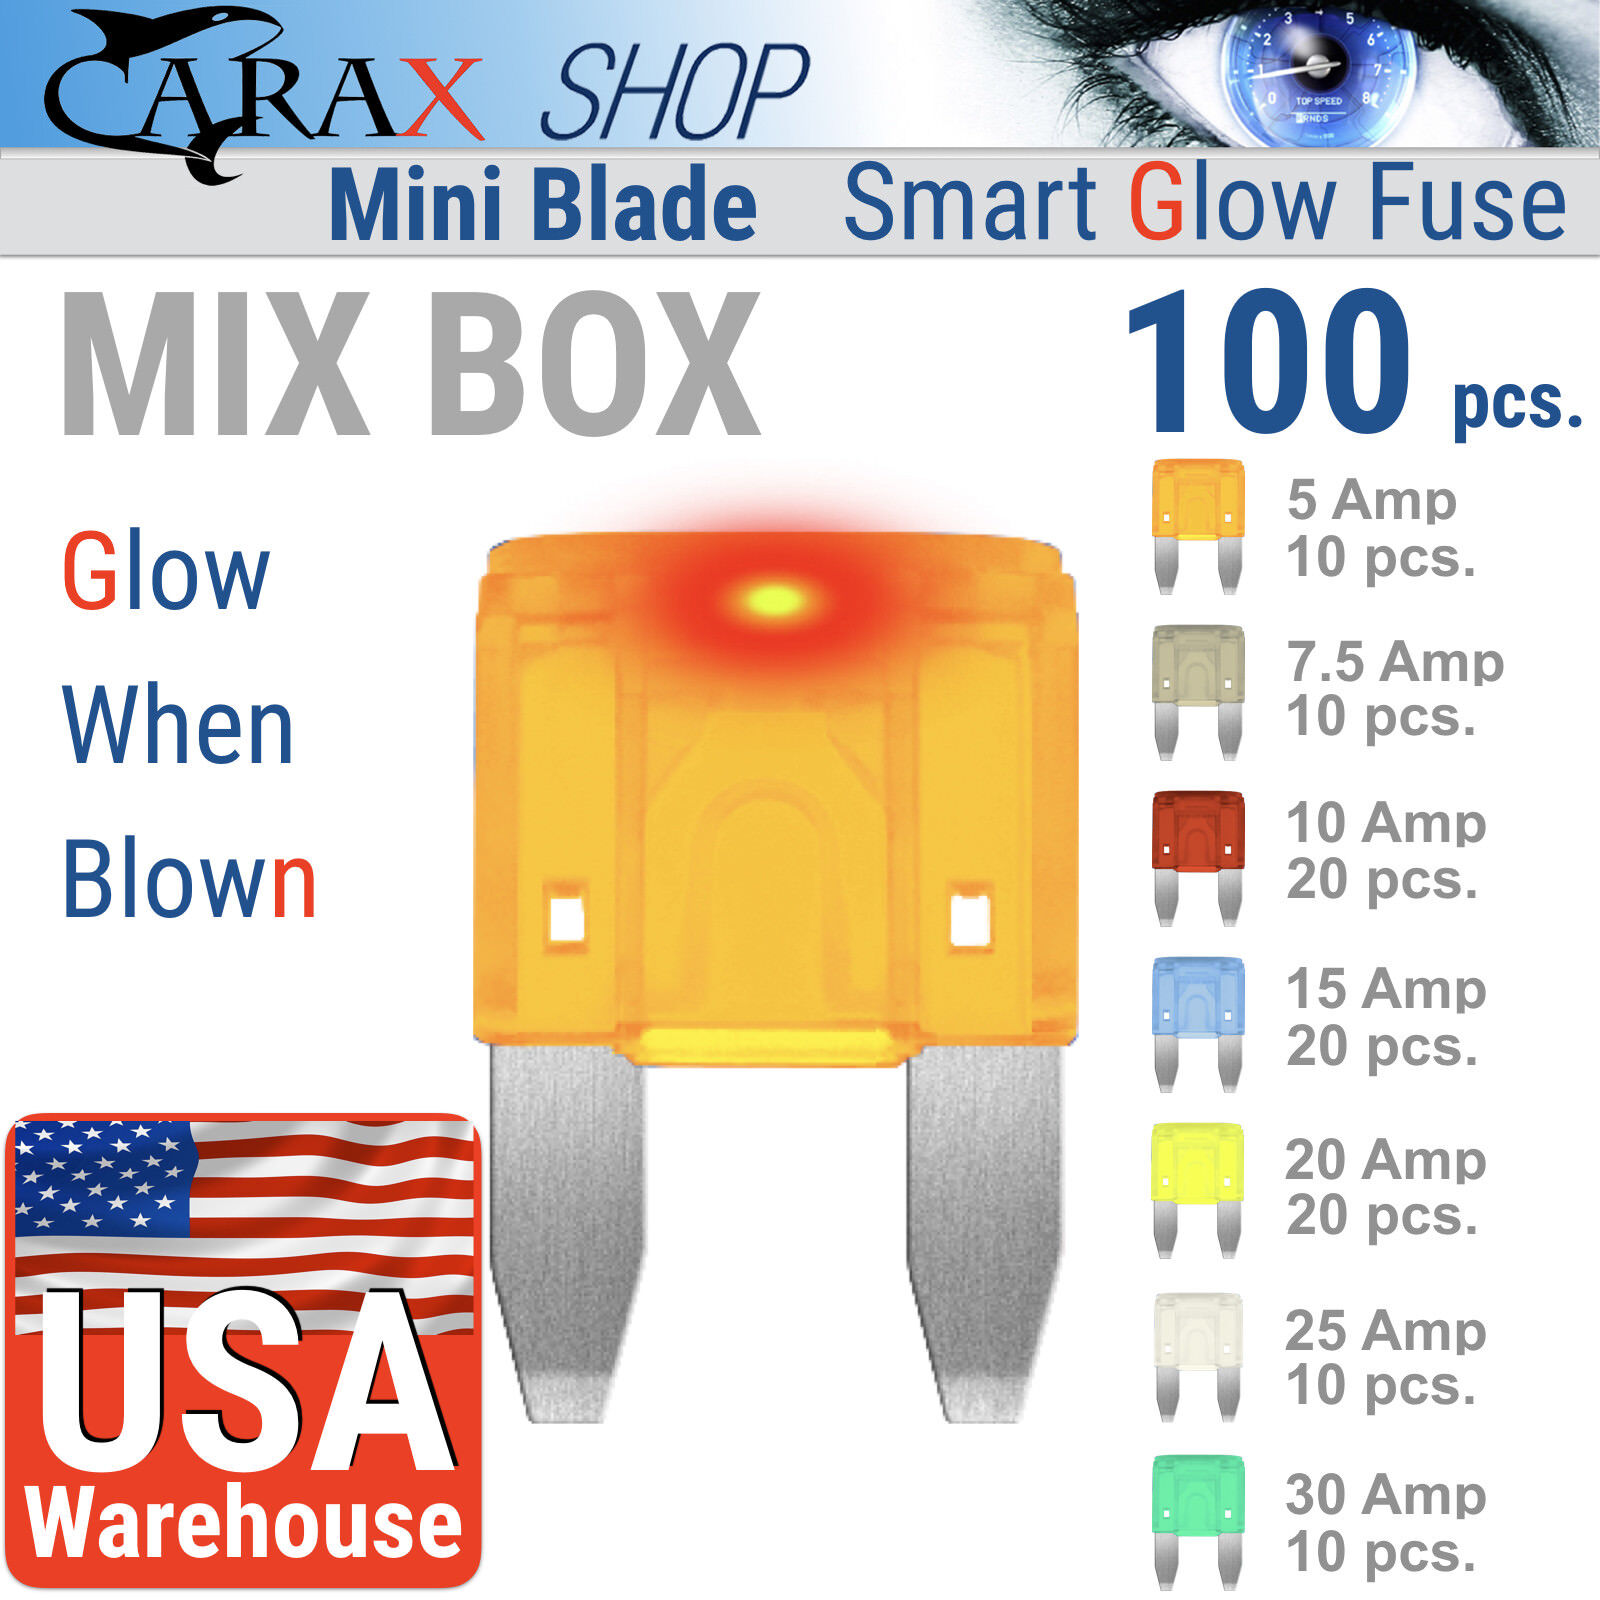 Fuses 100 Pcs Car Fuse Auto Smart Glow Automotive Box Small Mini Home Norton Secured Powered By Verisign